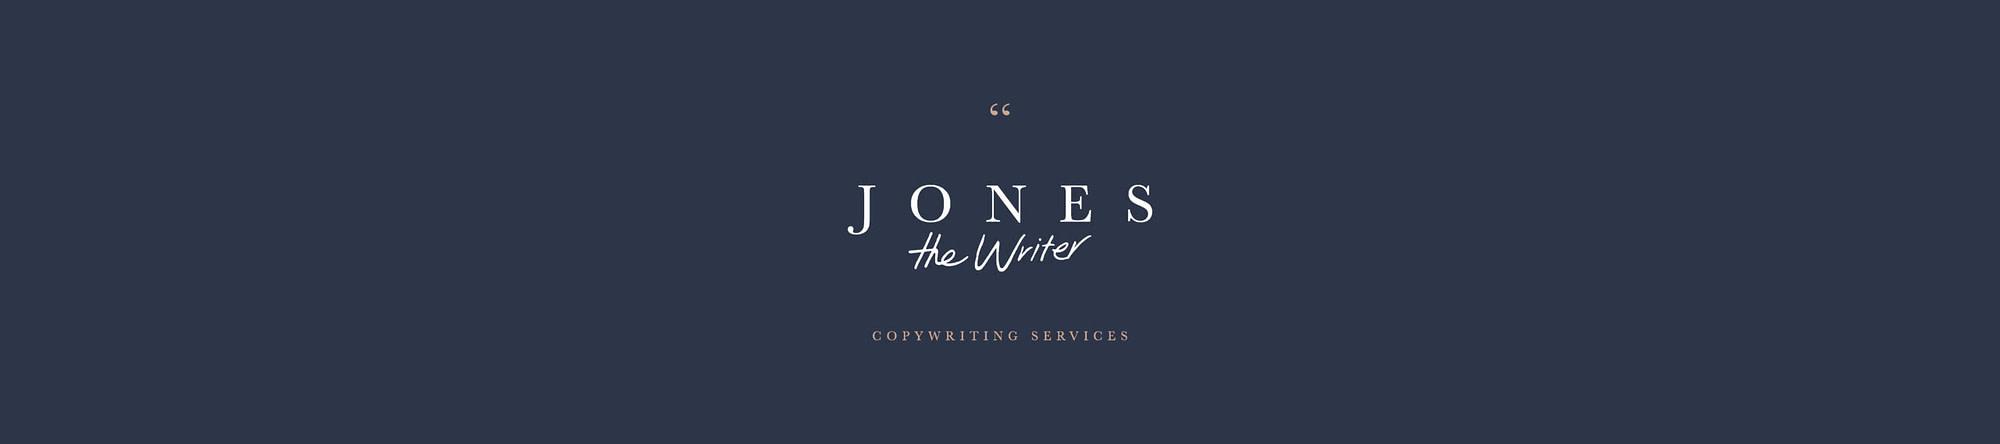 Jones the Writer Copywriting Services